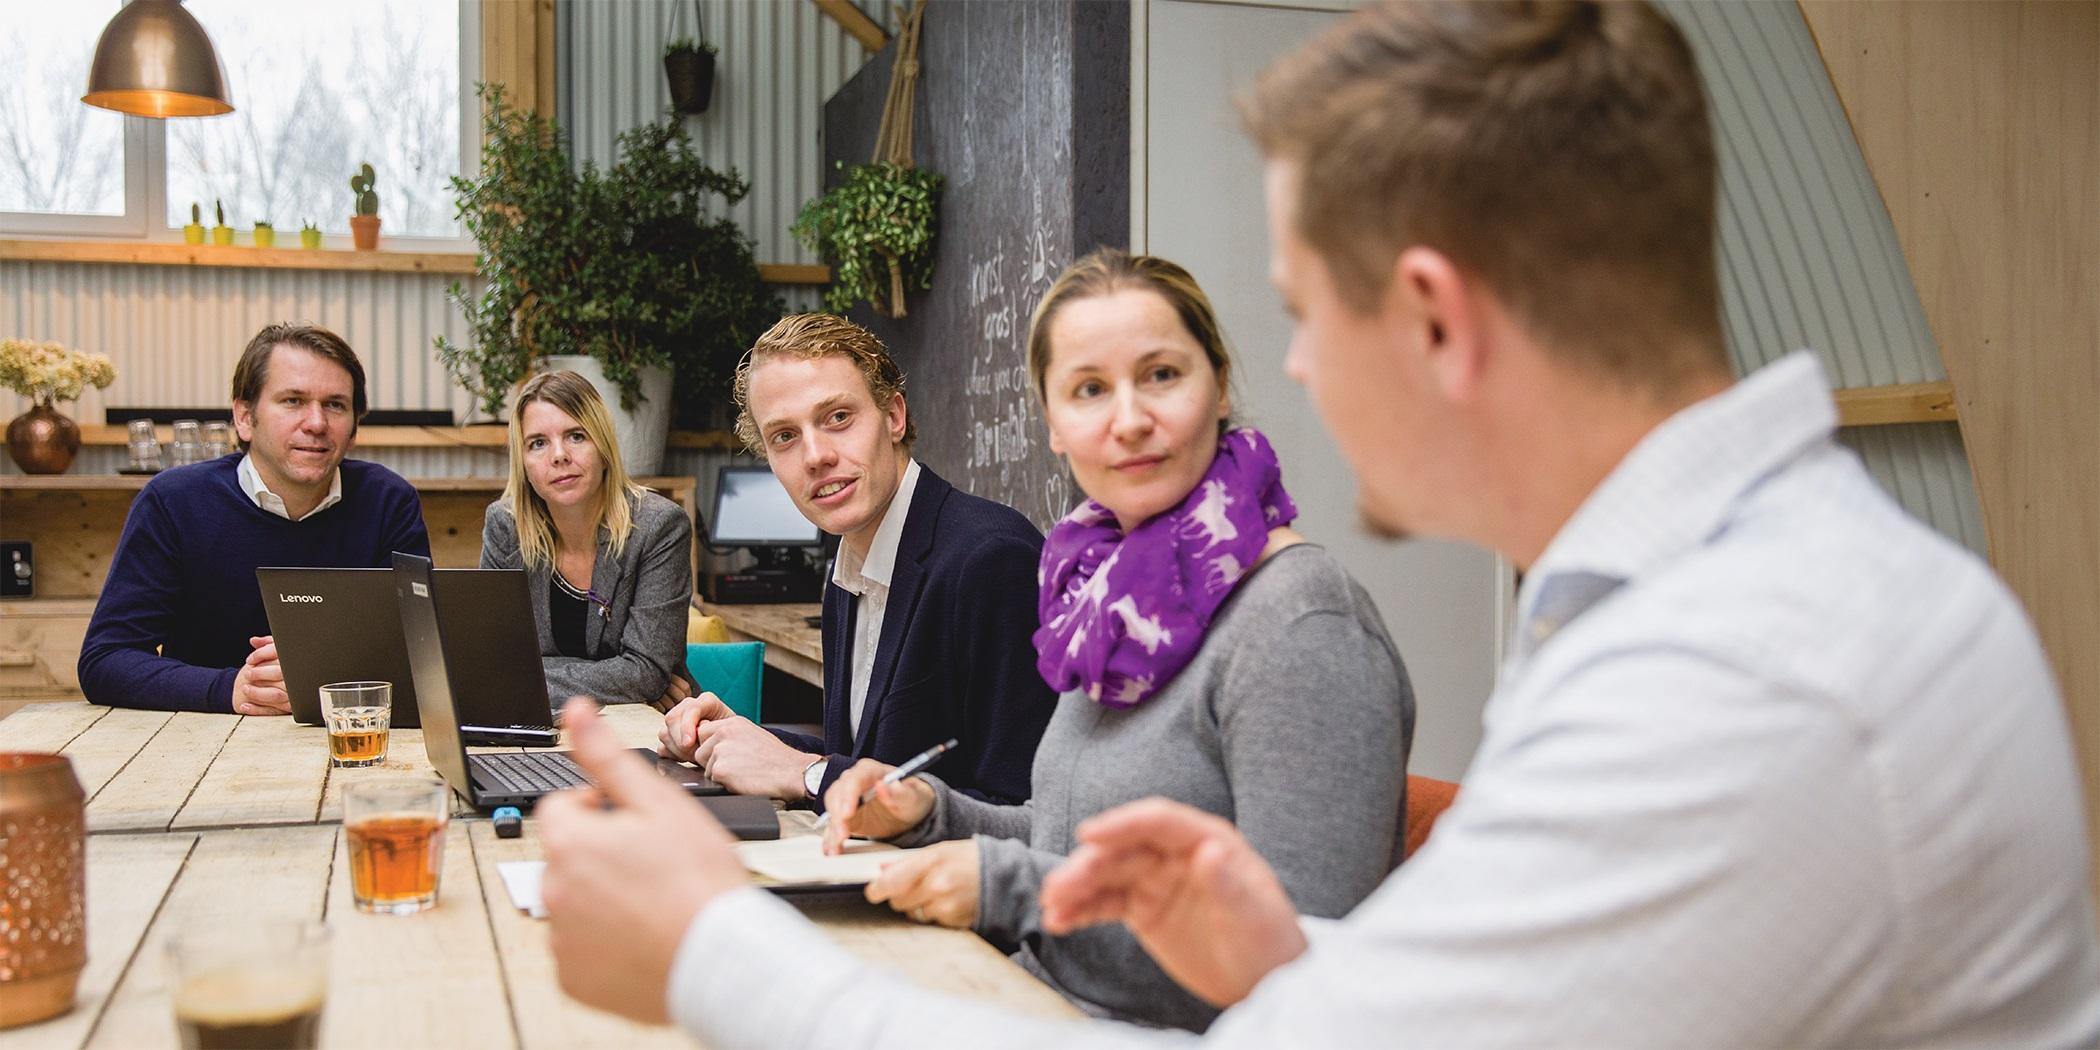 Escape Room Amsterdam personeelsuitje